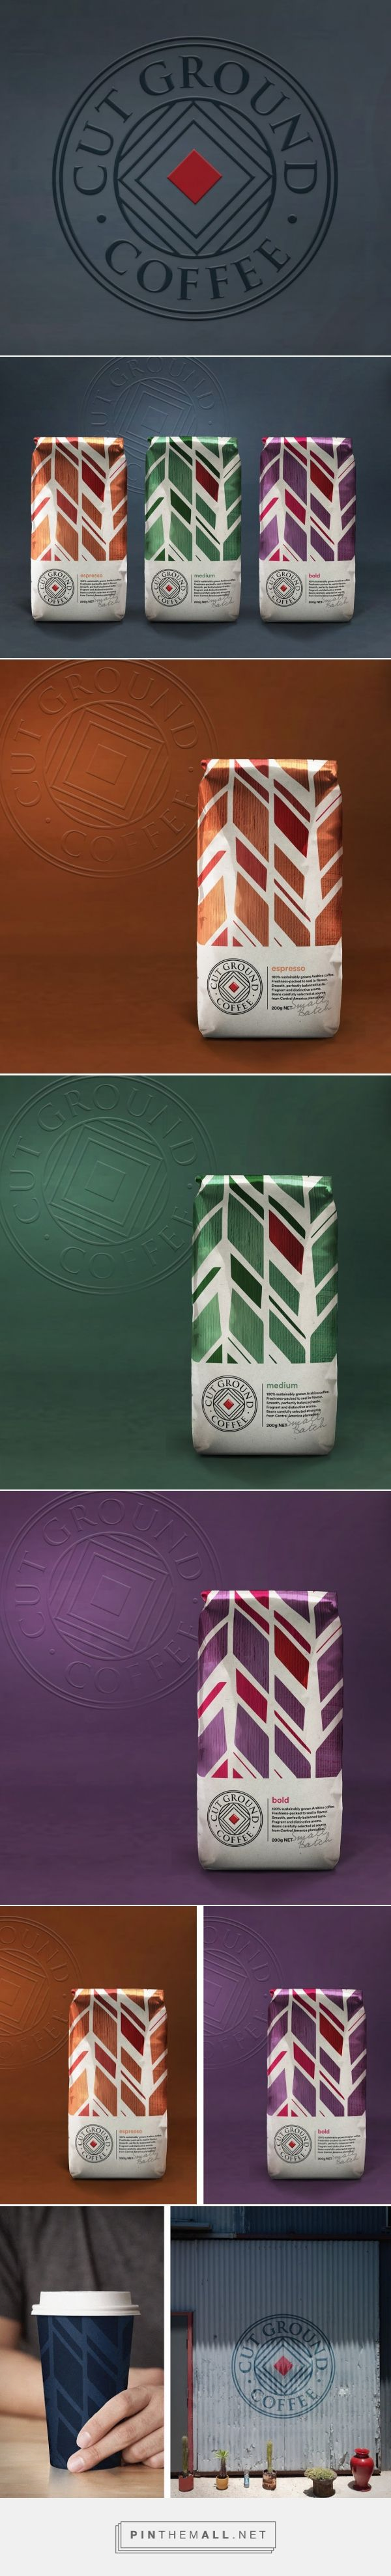 Cut Ground Coffee packaging design by Our Revolution (Australia) - http://www.packagingoftheworld.com/2016/06/cut-ground-coffee.html